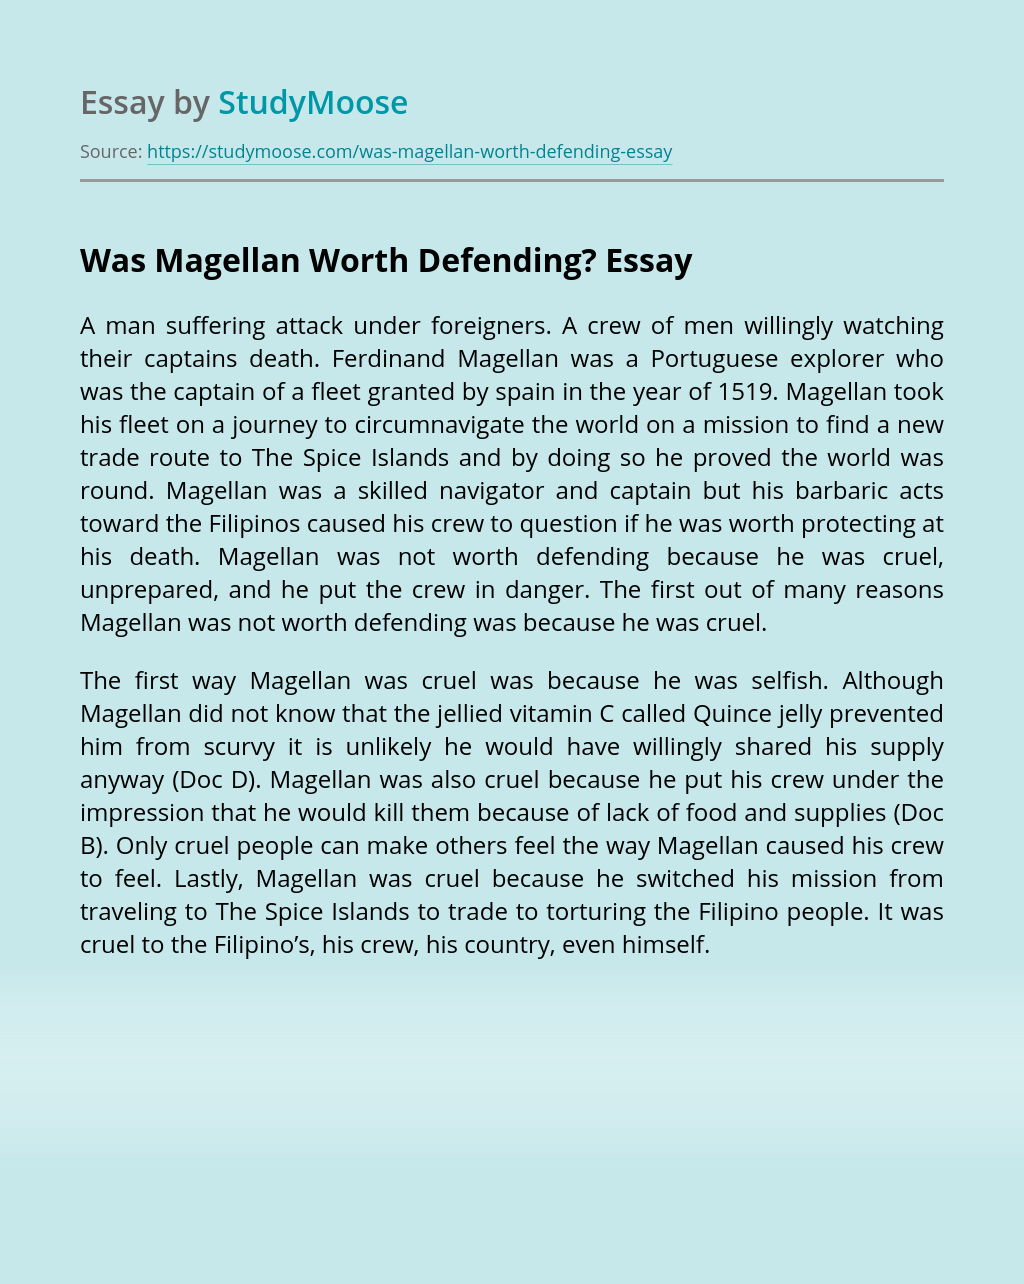 Was Magellan Worth Defending?